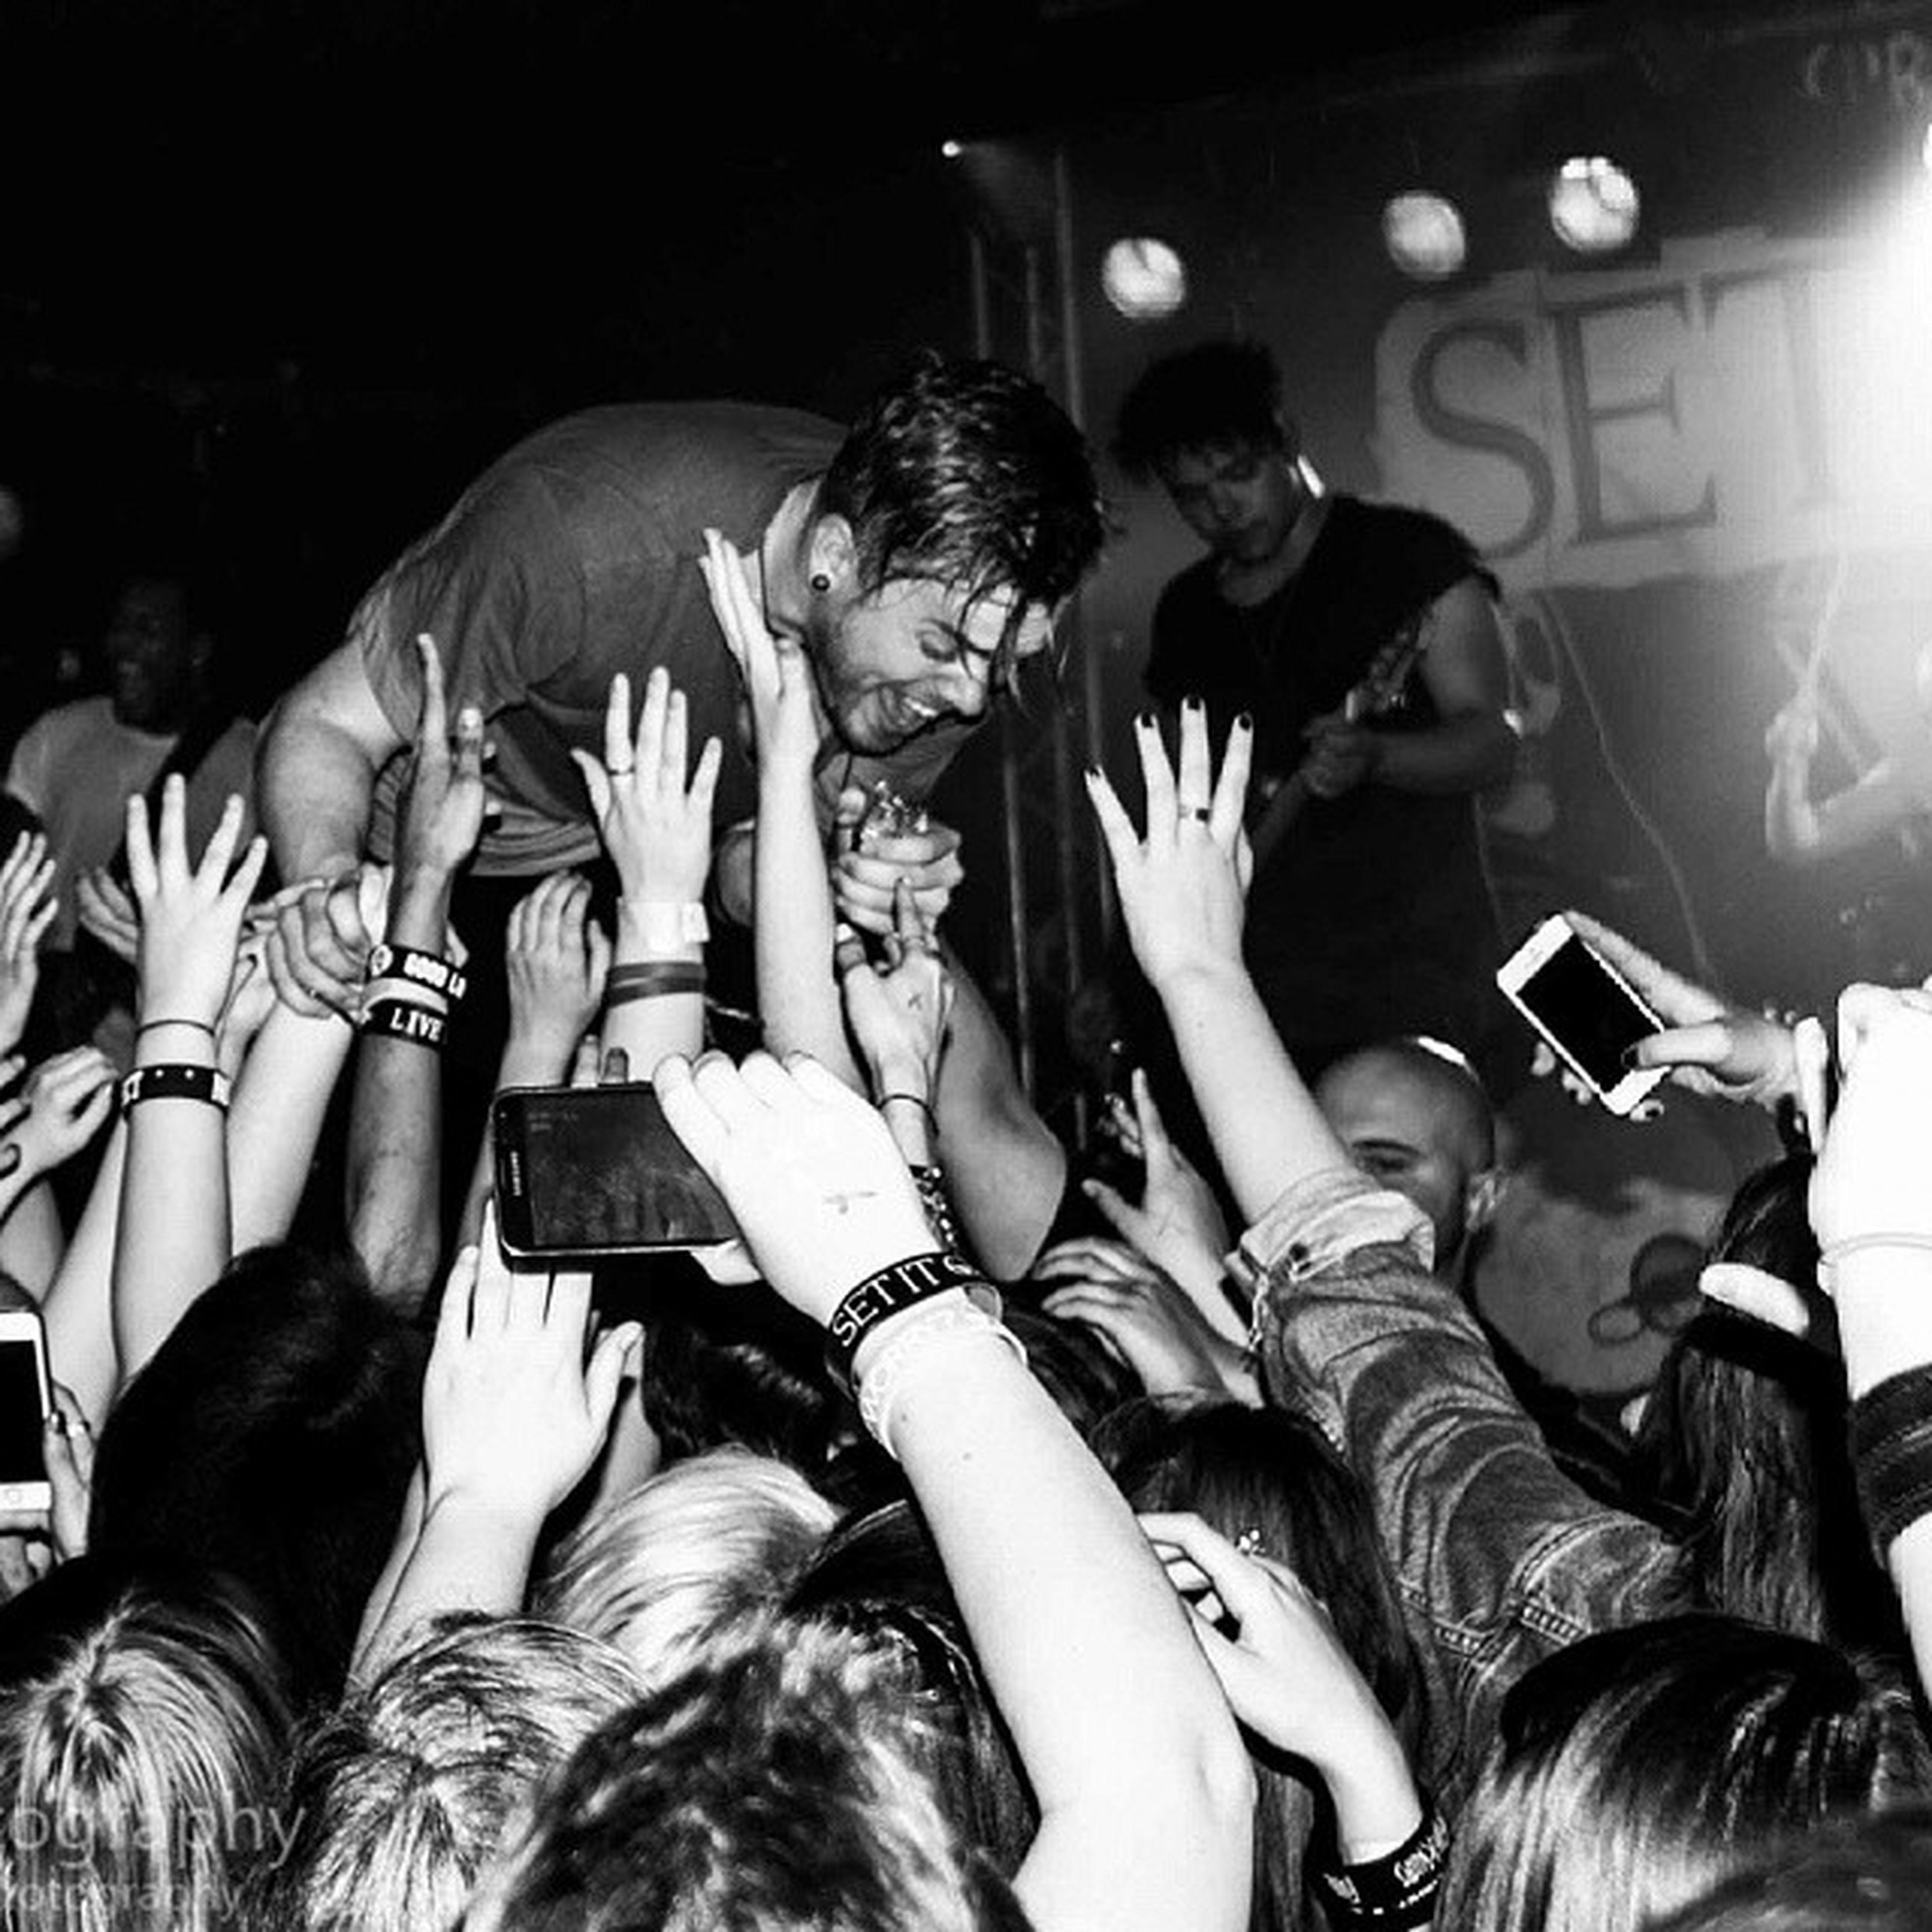 @codysio // @setitoffband // Birmingham ©Clara Parisi Photography - Codysio Setitoff Theasylumvenue TheAsylum Claraparisiphotography Crowd Blackandwhite Birmingham Mono Uprawrlive Musicphotography